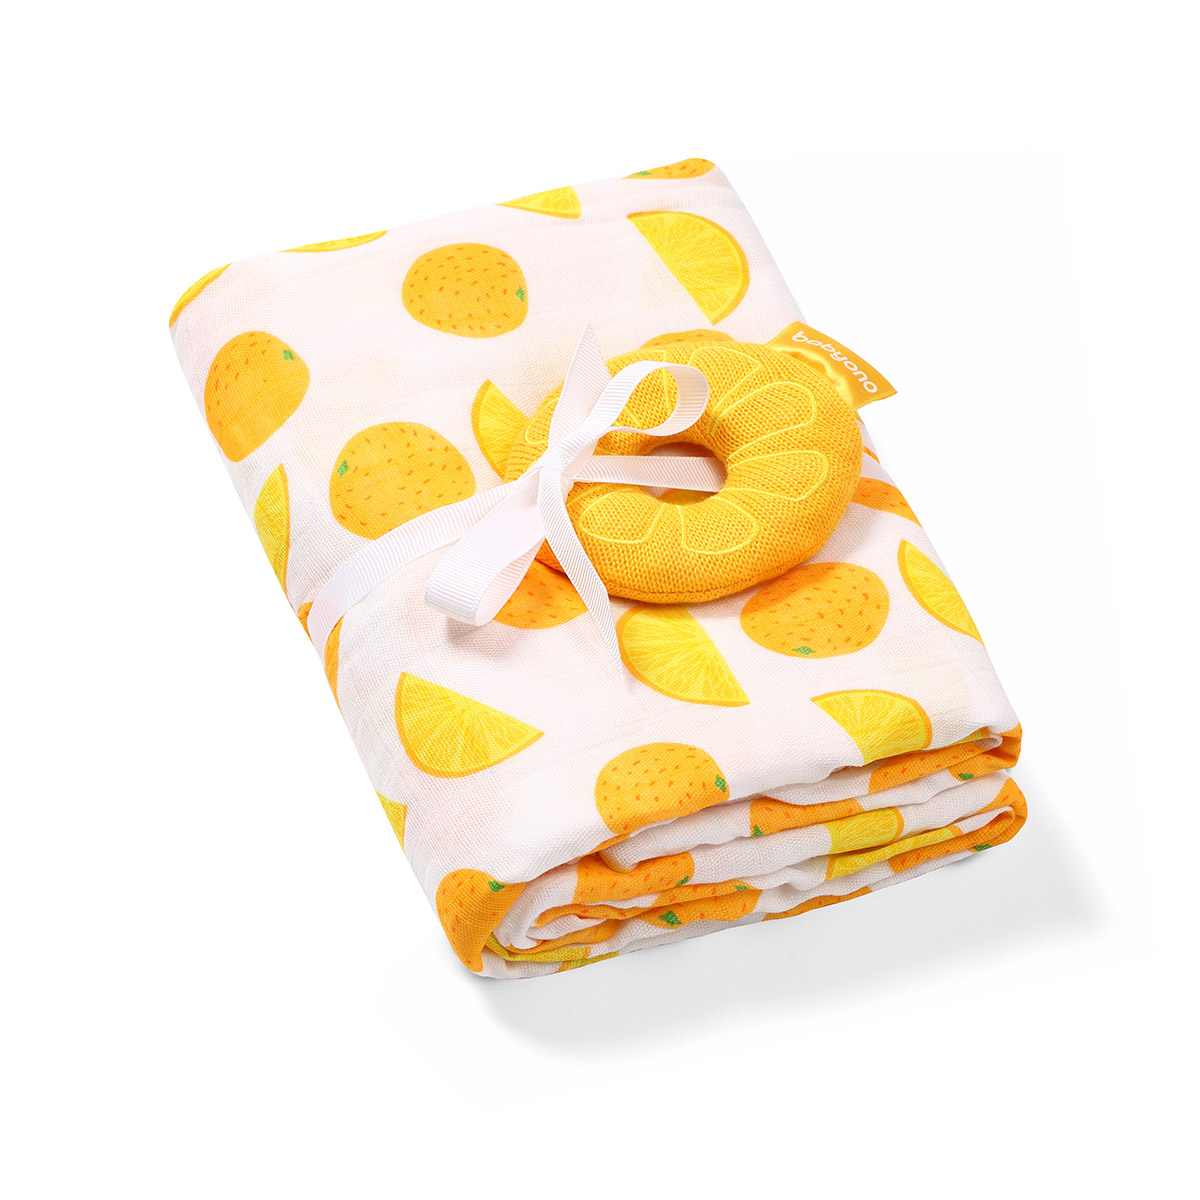 BabyOno: Απαλή πάνα αγκαλιάς με μαλακή κουδουνίστρα από Μπαμπού και Βαμβάκι 120*120εκ - Orange